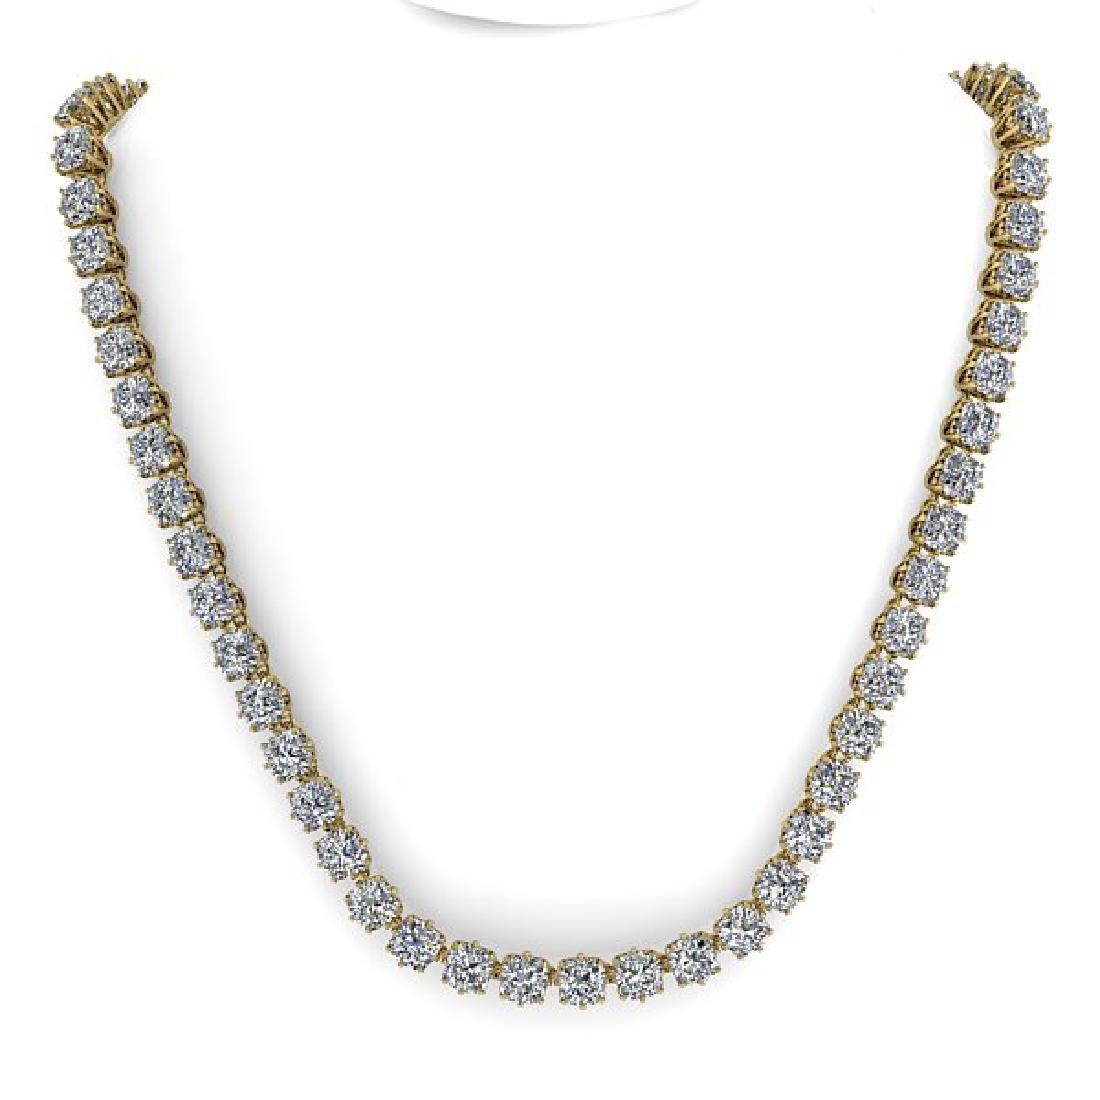 28 CTW Oval Cut SI Certified Diamond Necklace 18K - 3